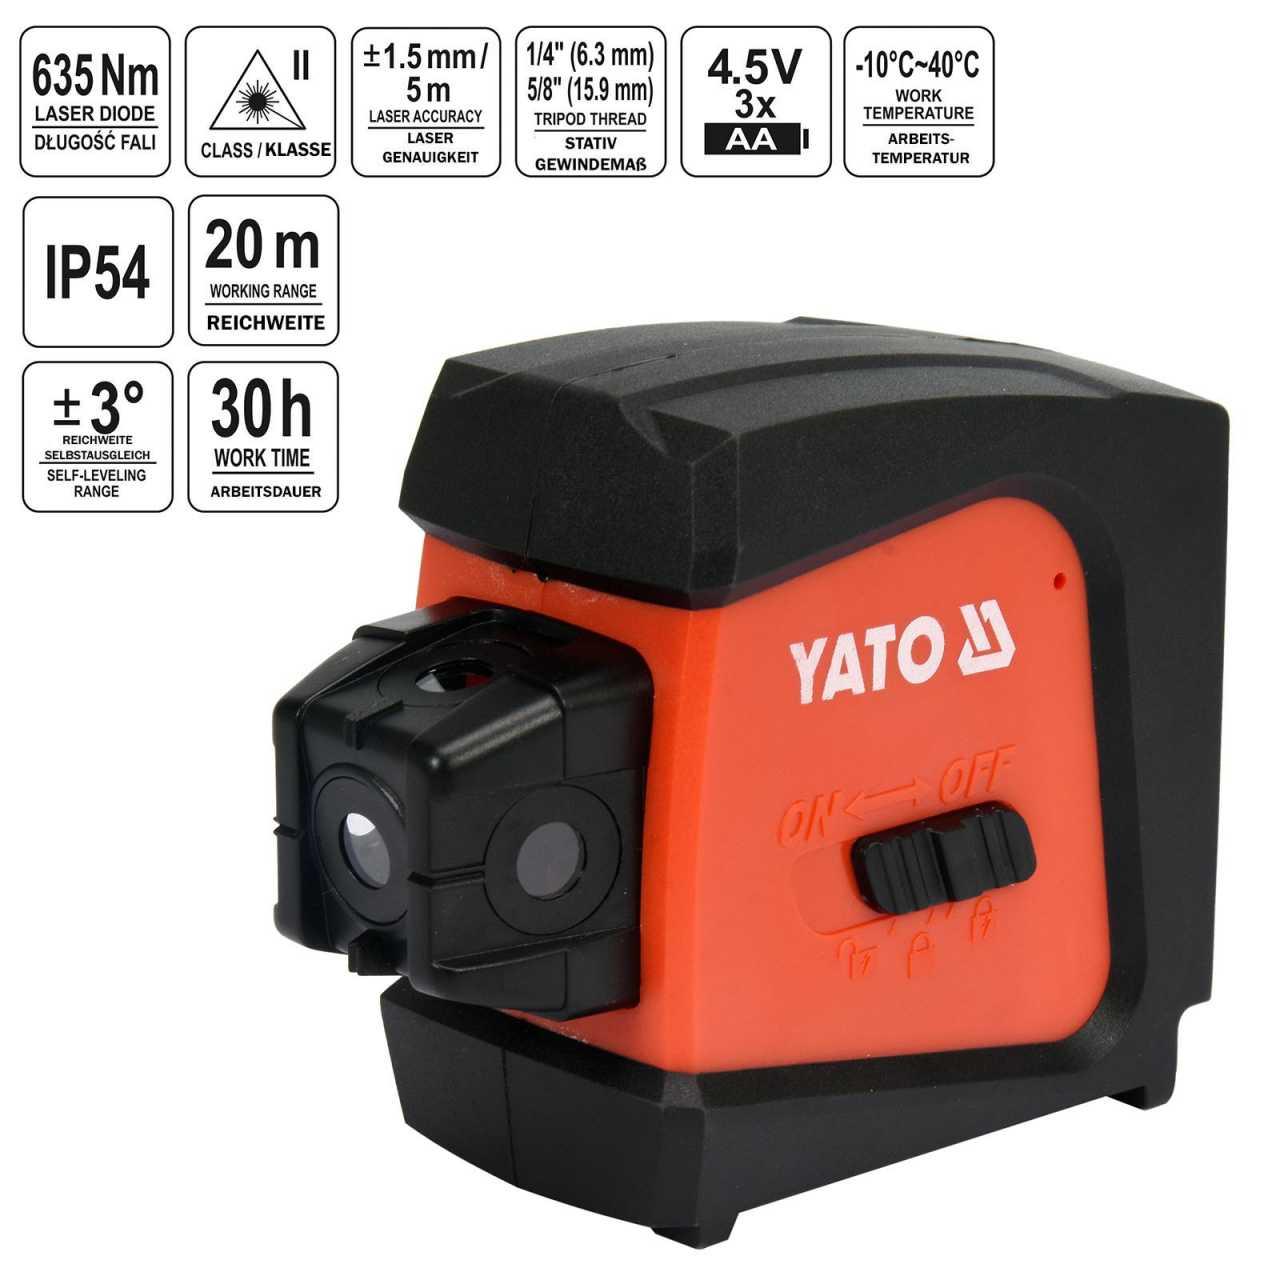 YATO Profi 5-Punktlaser 20m selbstnivellierend YT-30427